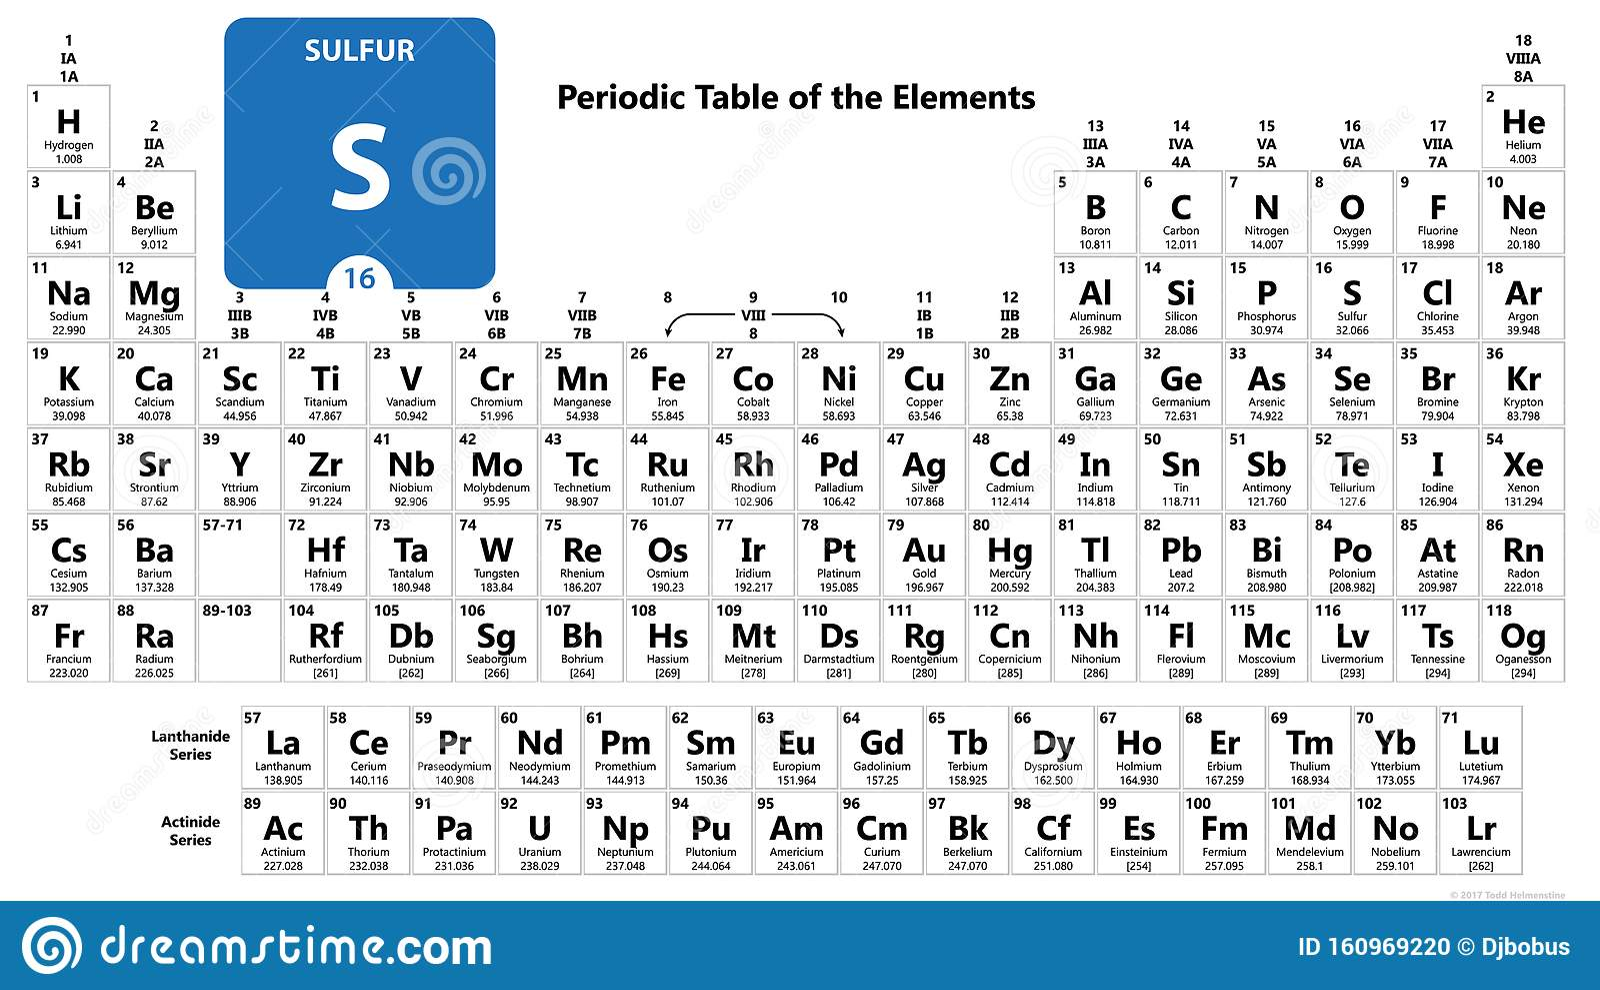 S Atomic Number